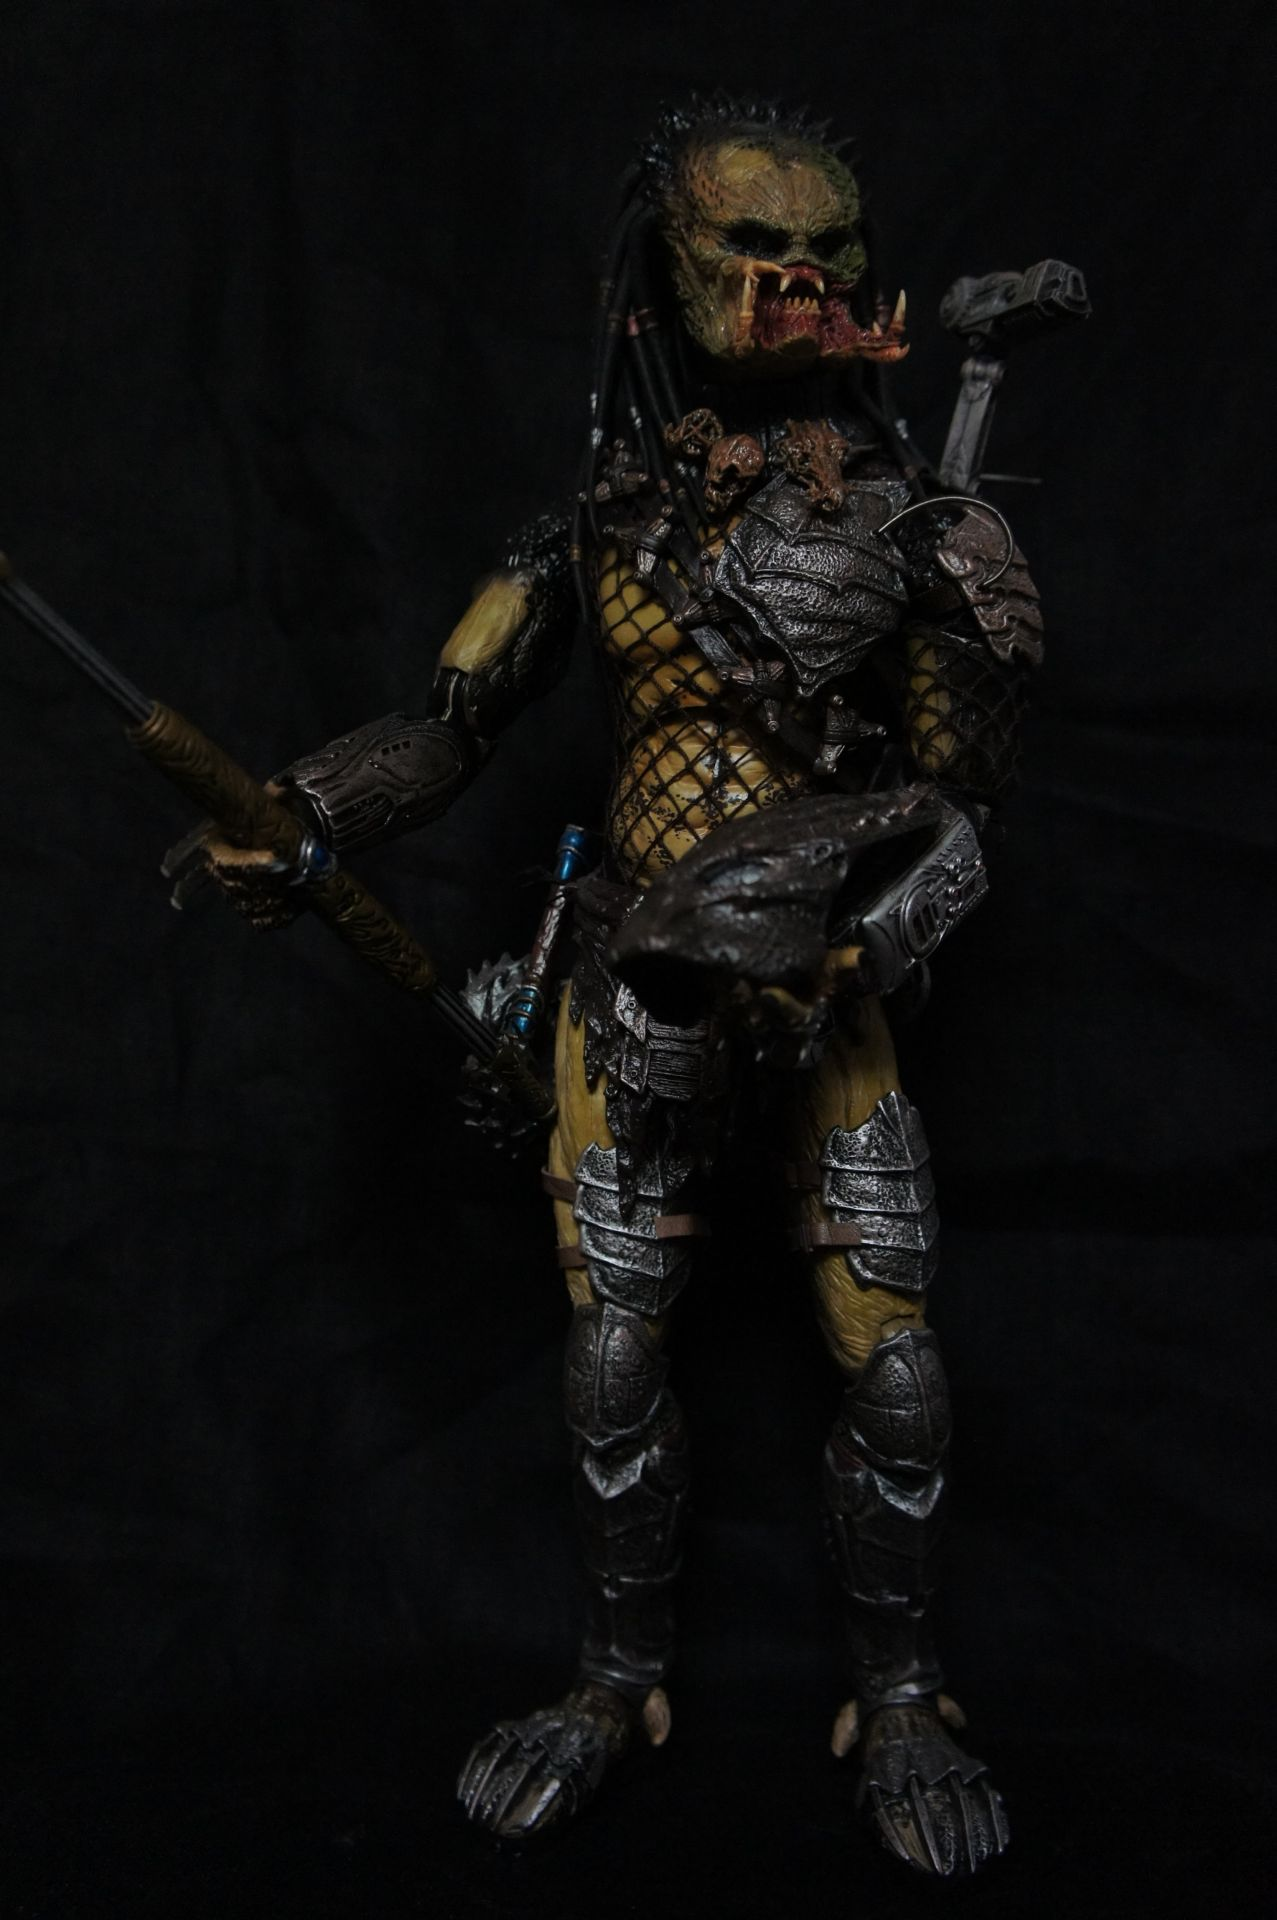 MF Doom colec 52dbb80952ebd